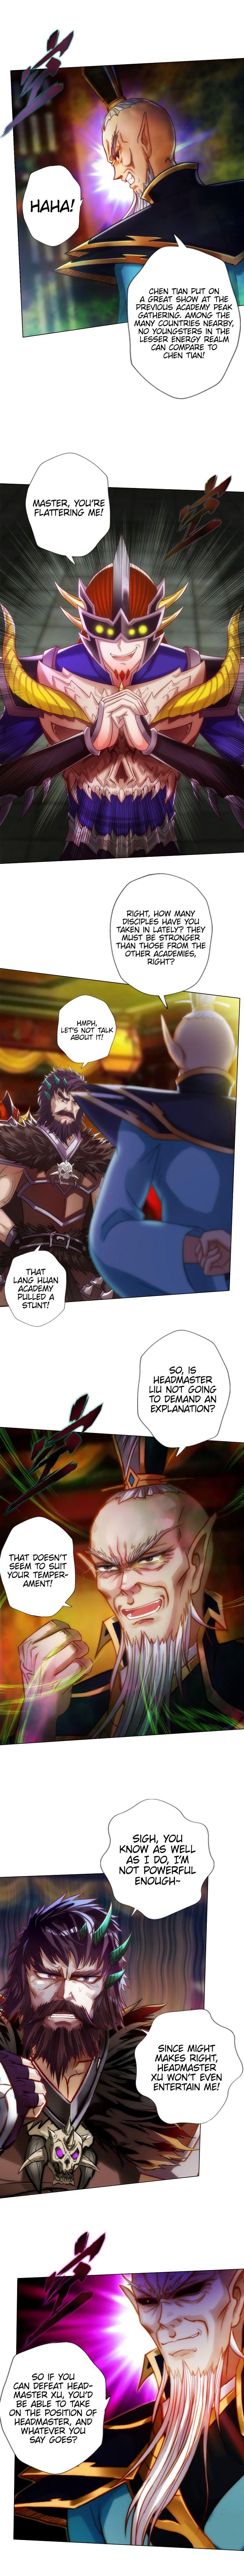 Manga Lang Huan Library - Chapter 74 Page 3